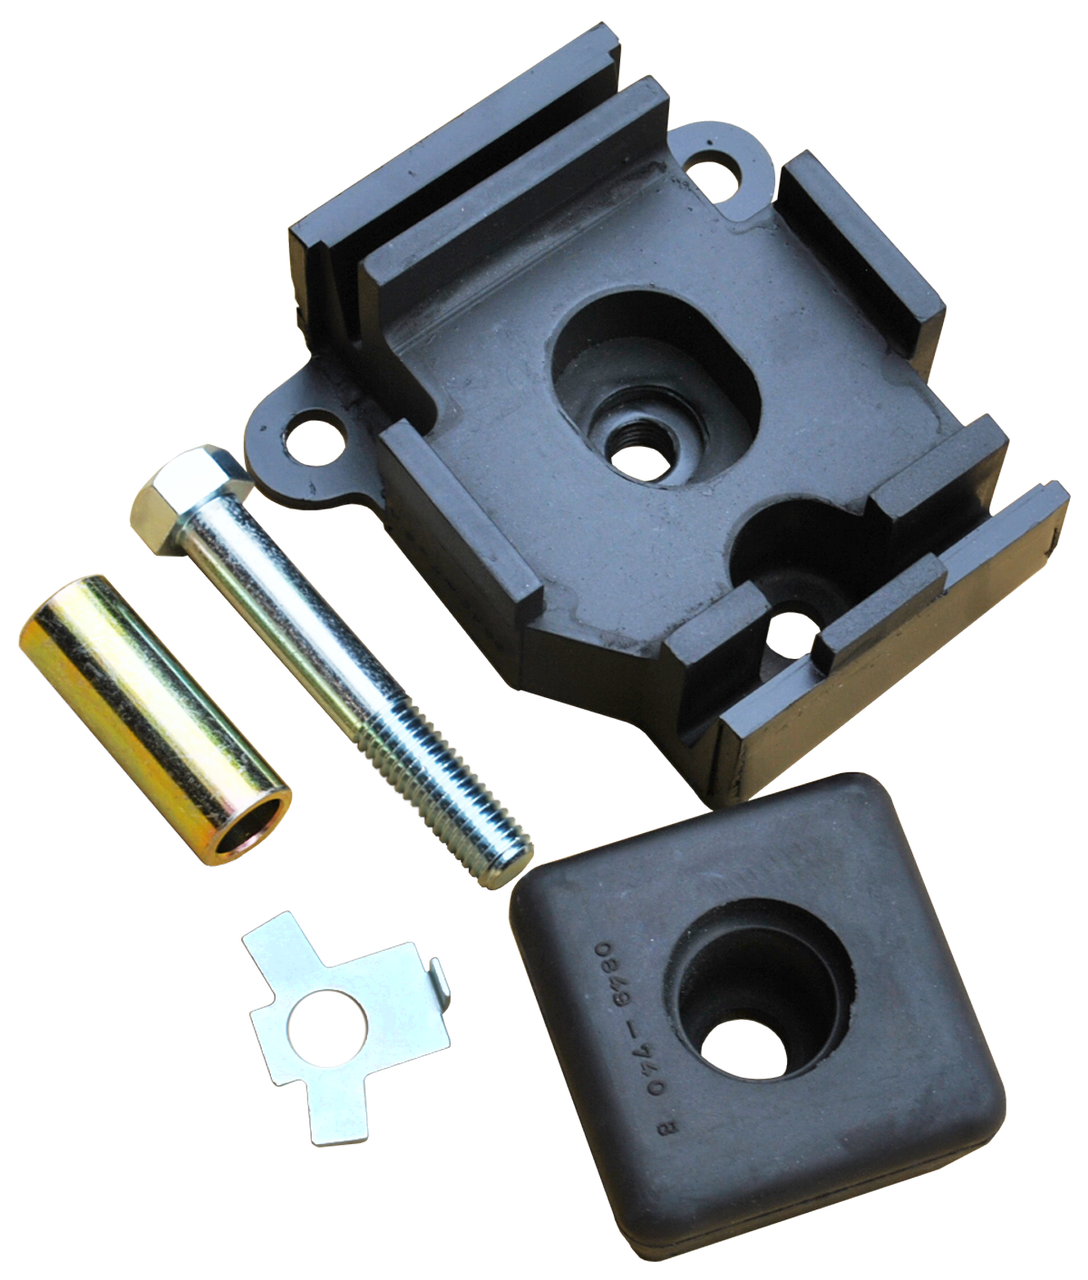 68-'71 396/402 BIG BLOCK MOTOR MOUNT KIT - Key Parts, Inc